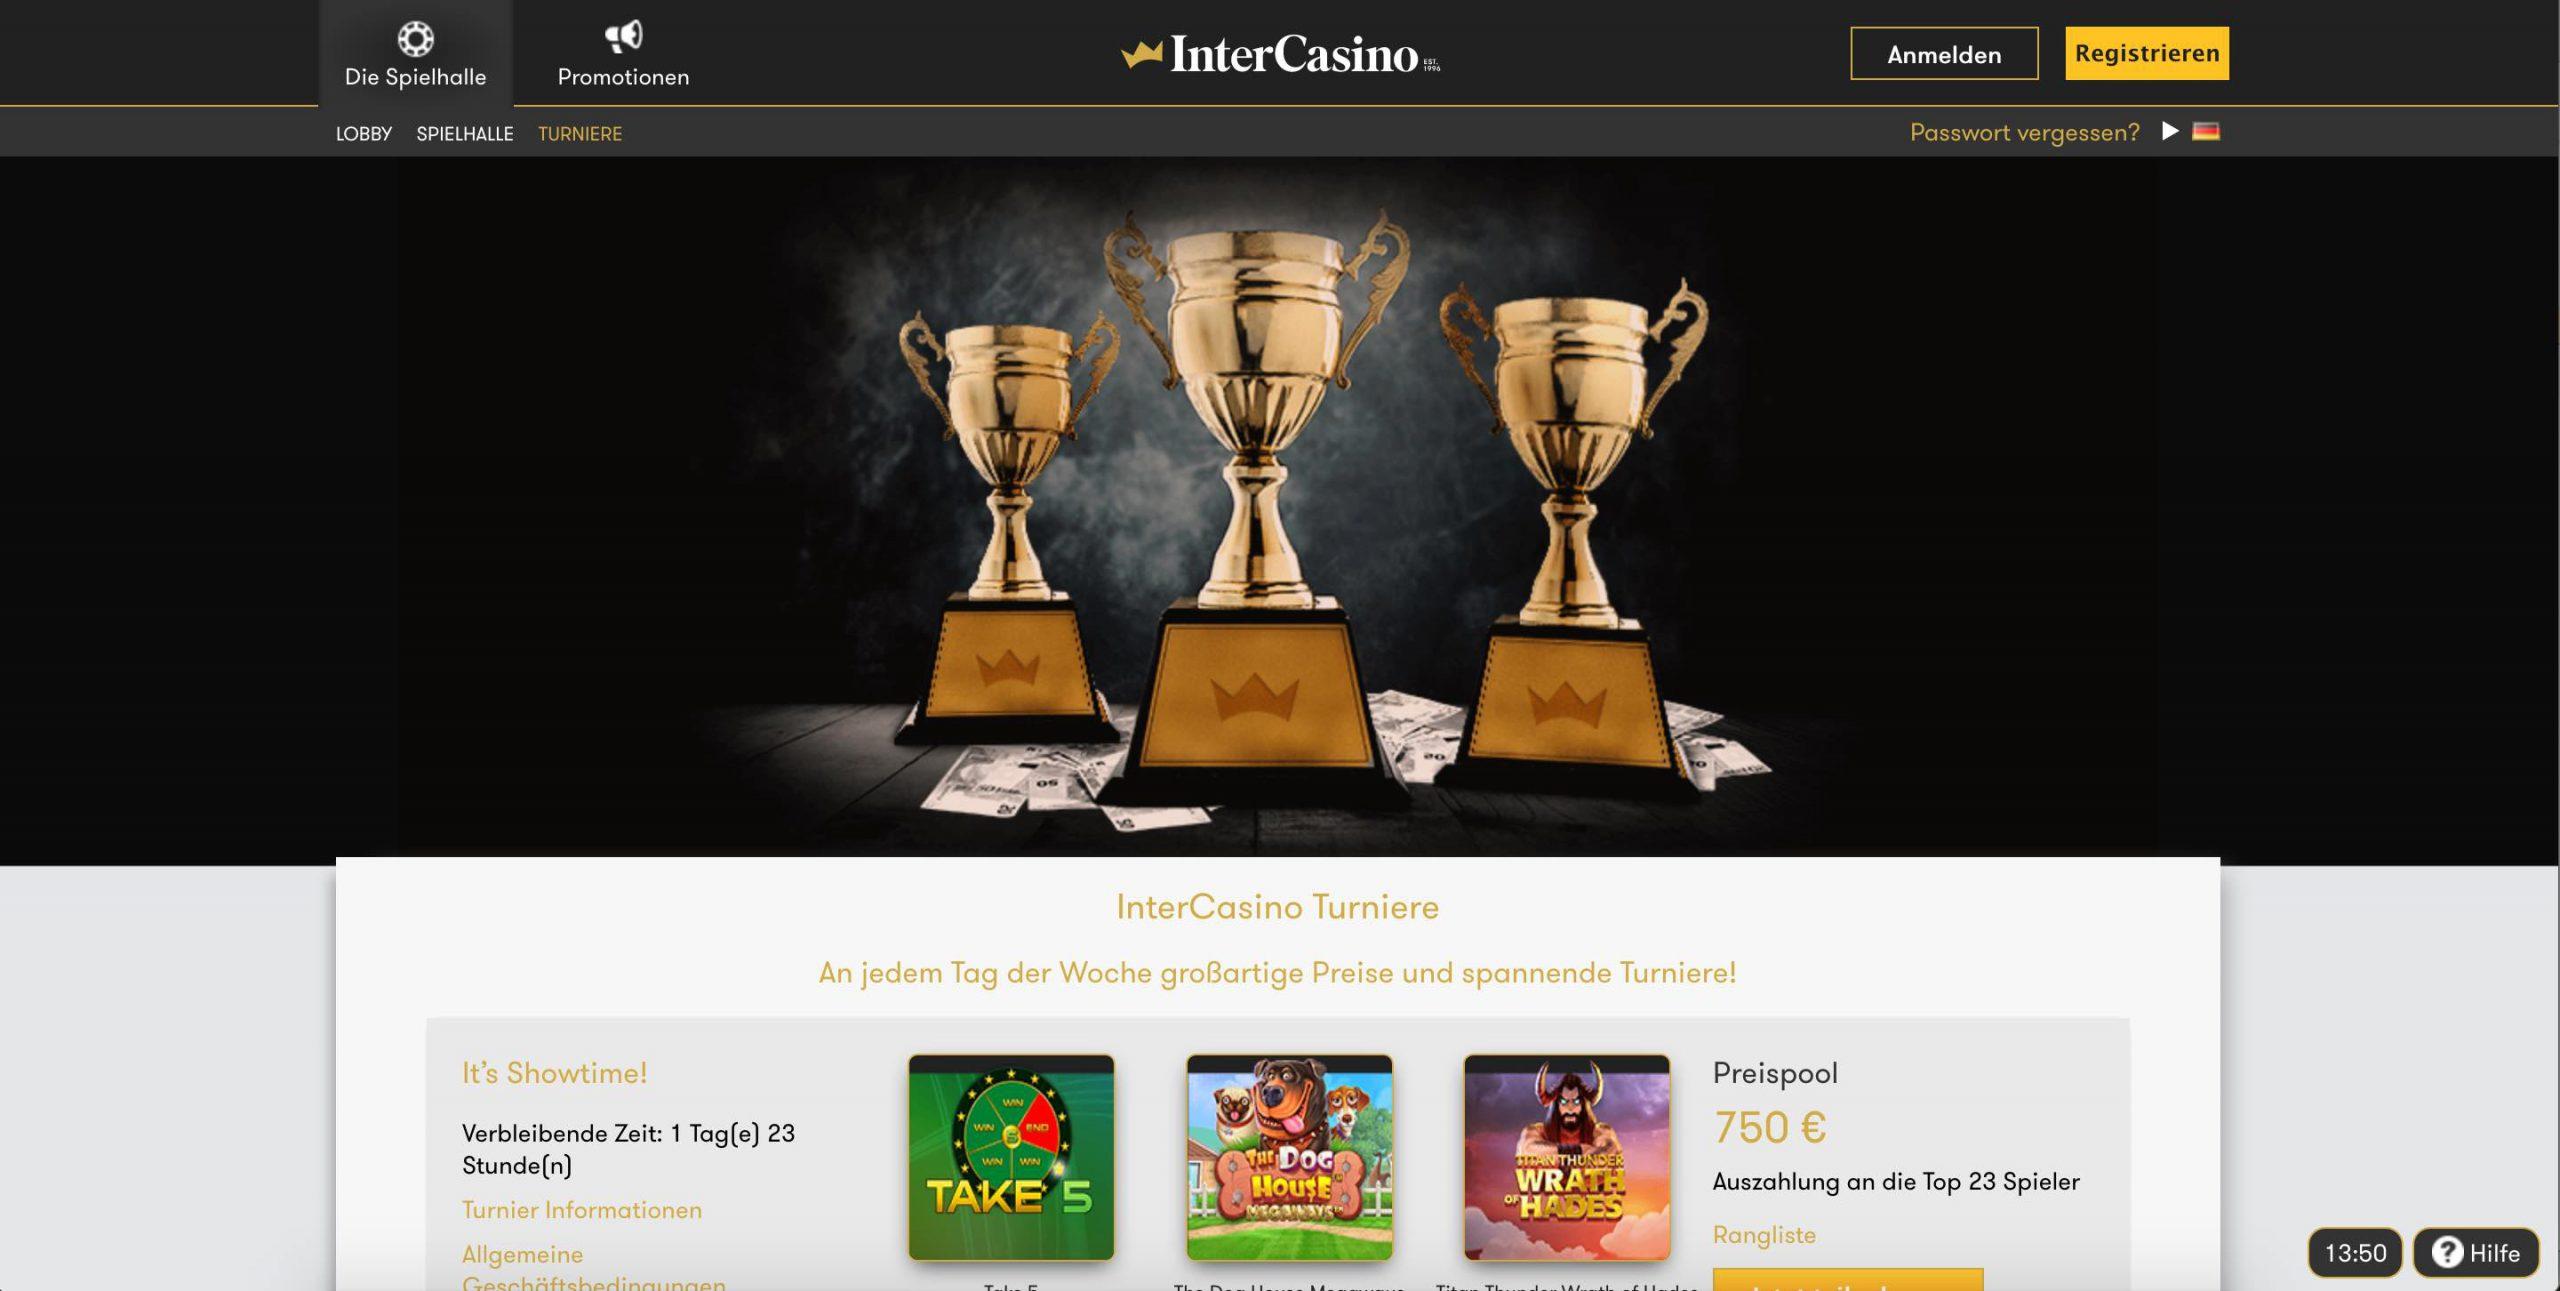 InterCasino Turniere